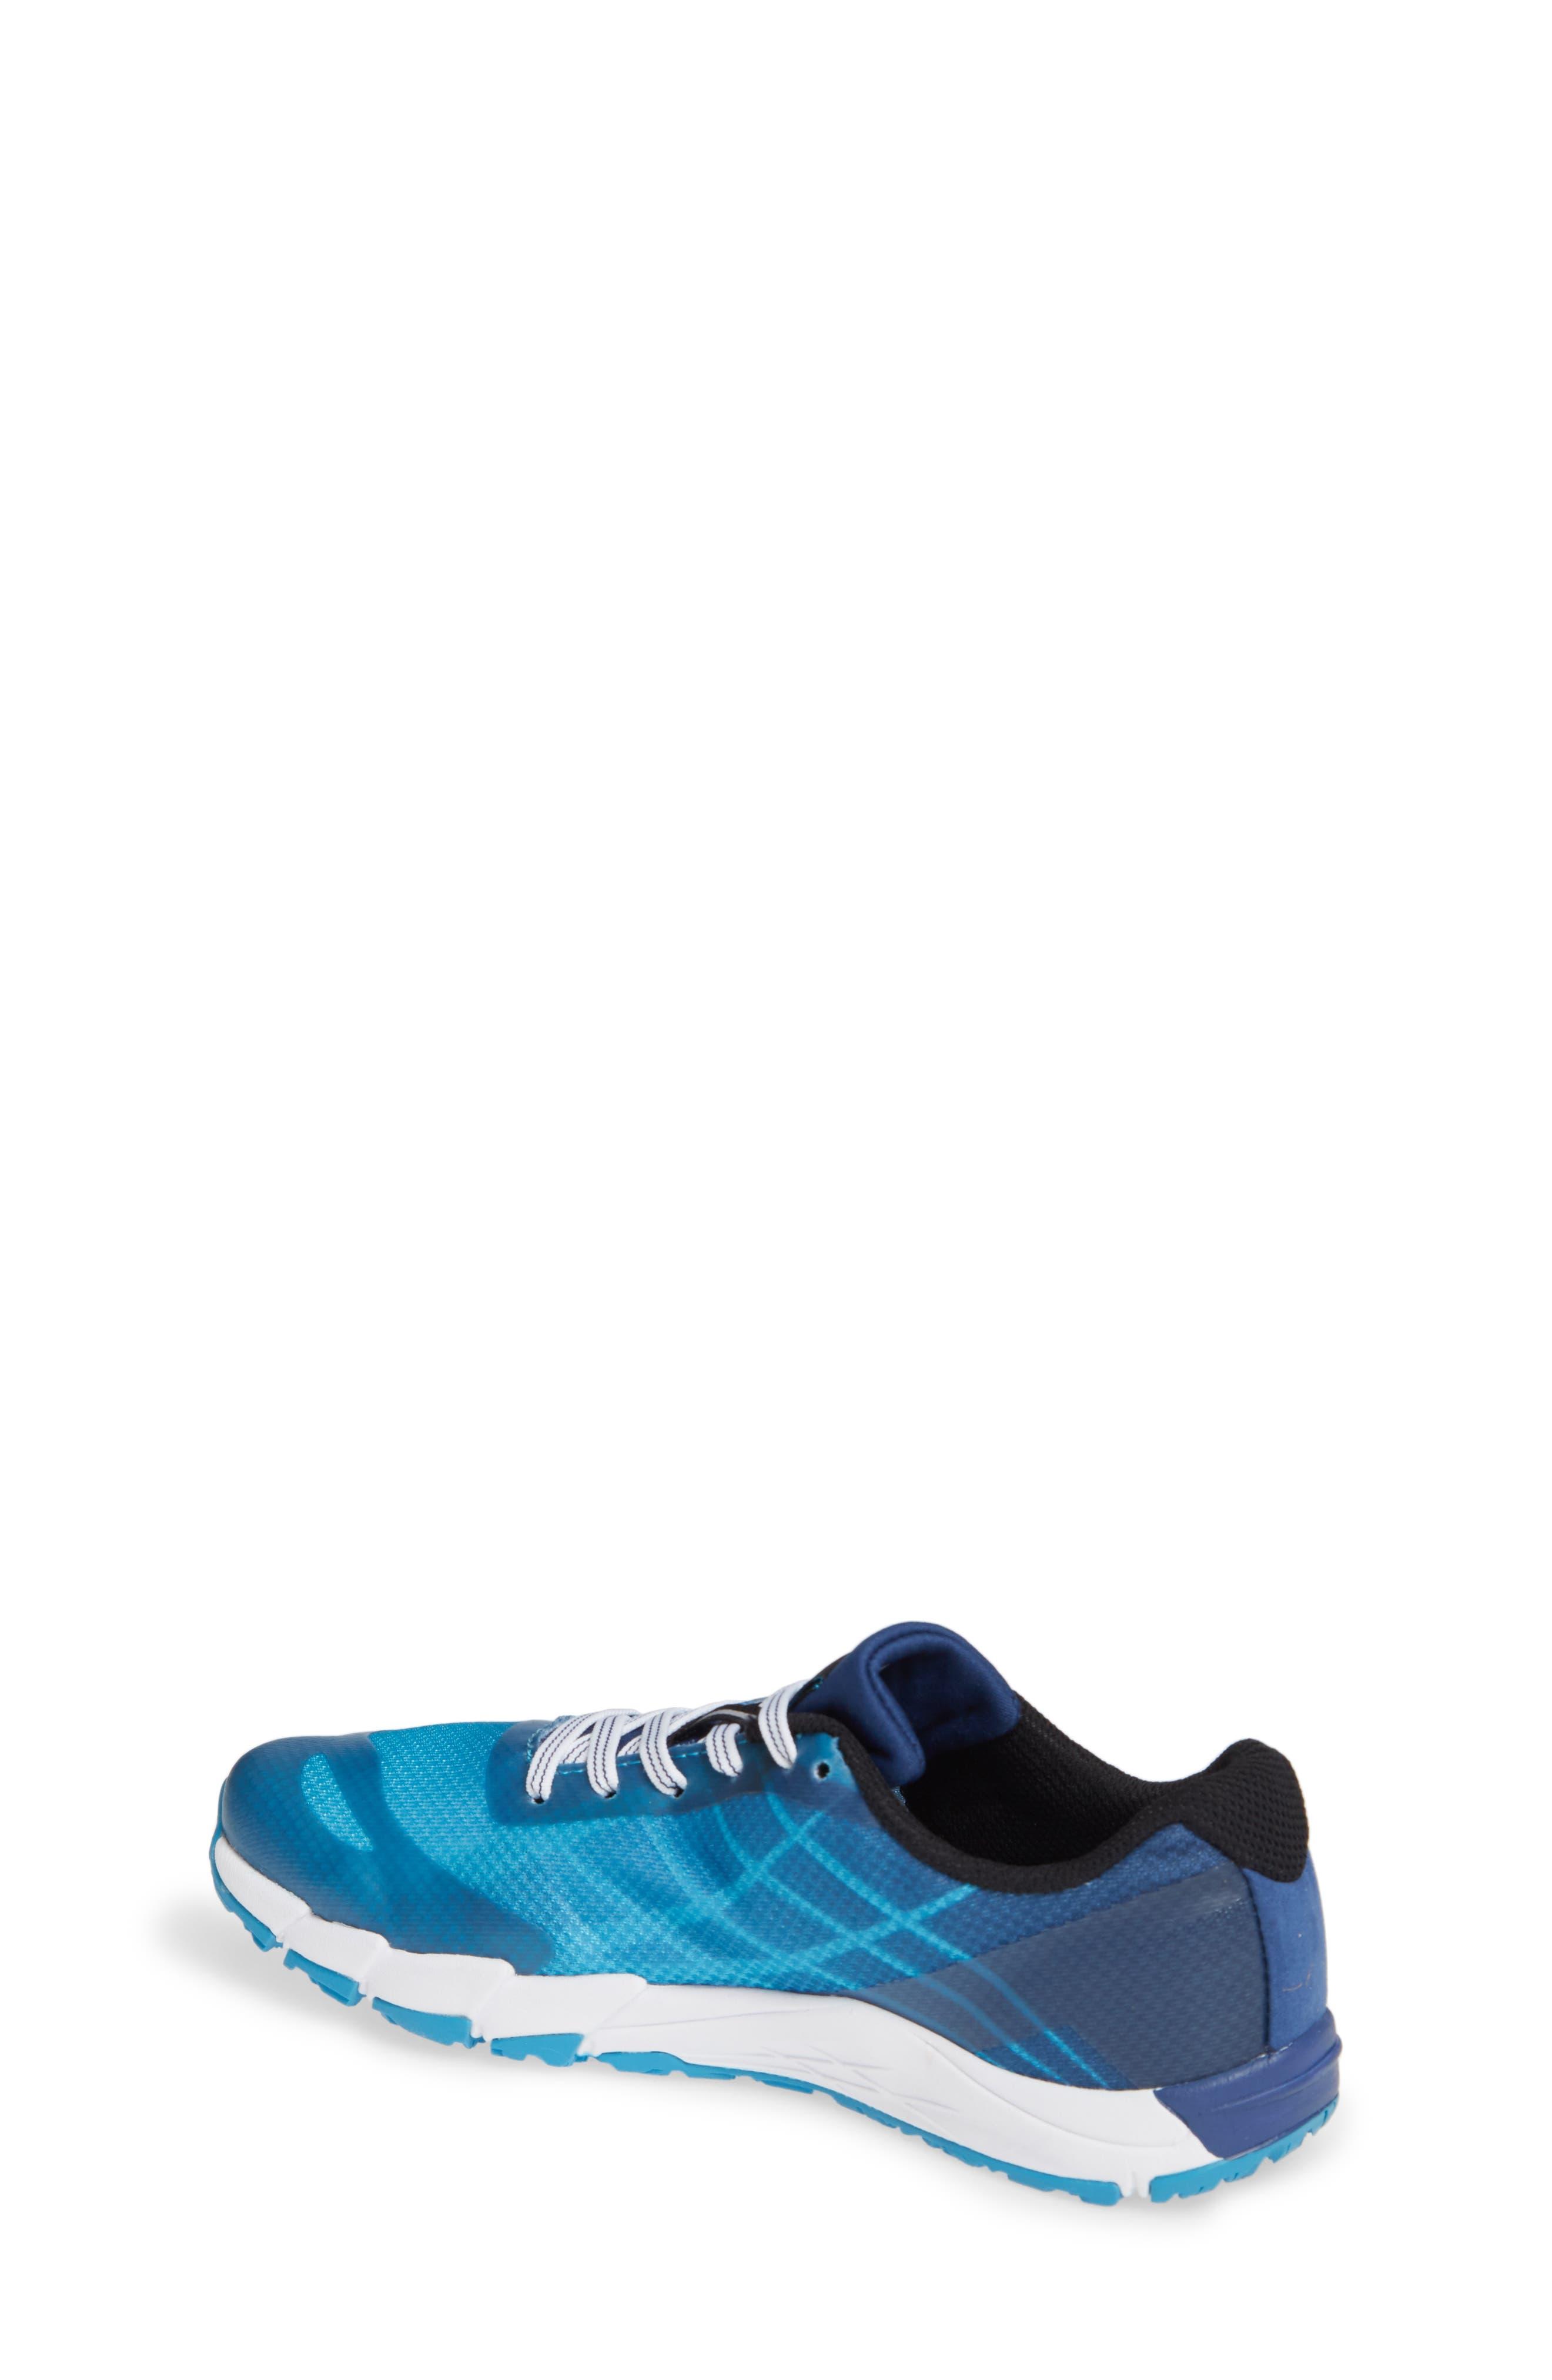 MERRELL, Bare Access Sneaker, Alternate thumbnail 2, color, BLUE SYNTHETIC